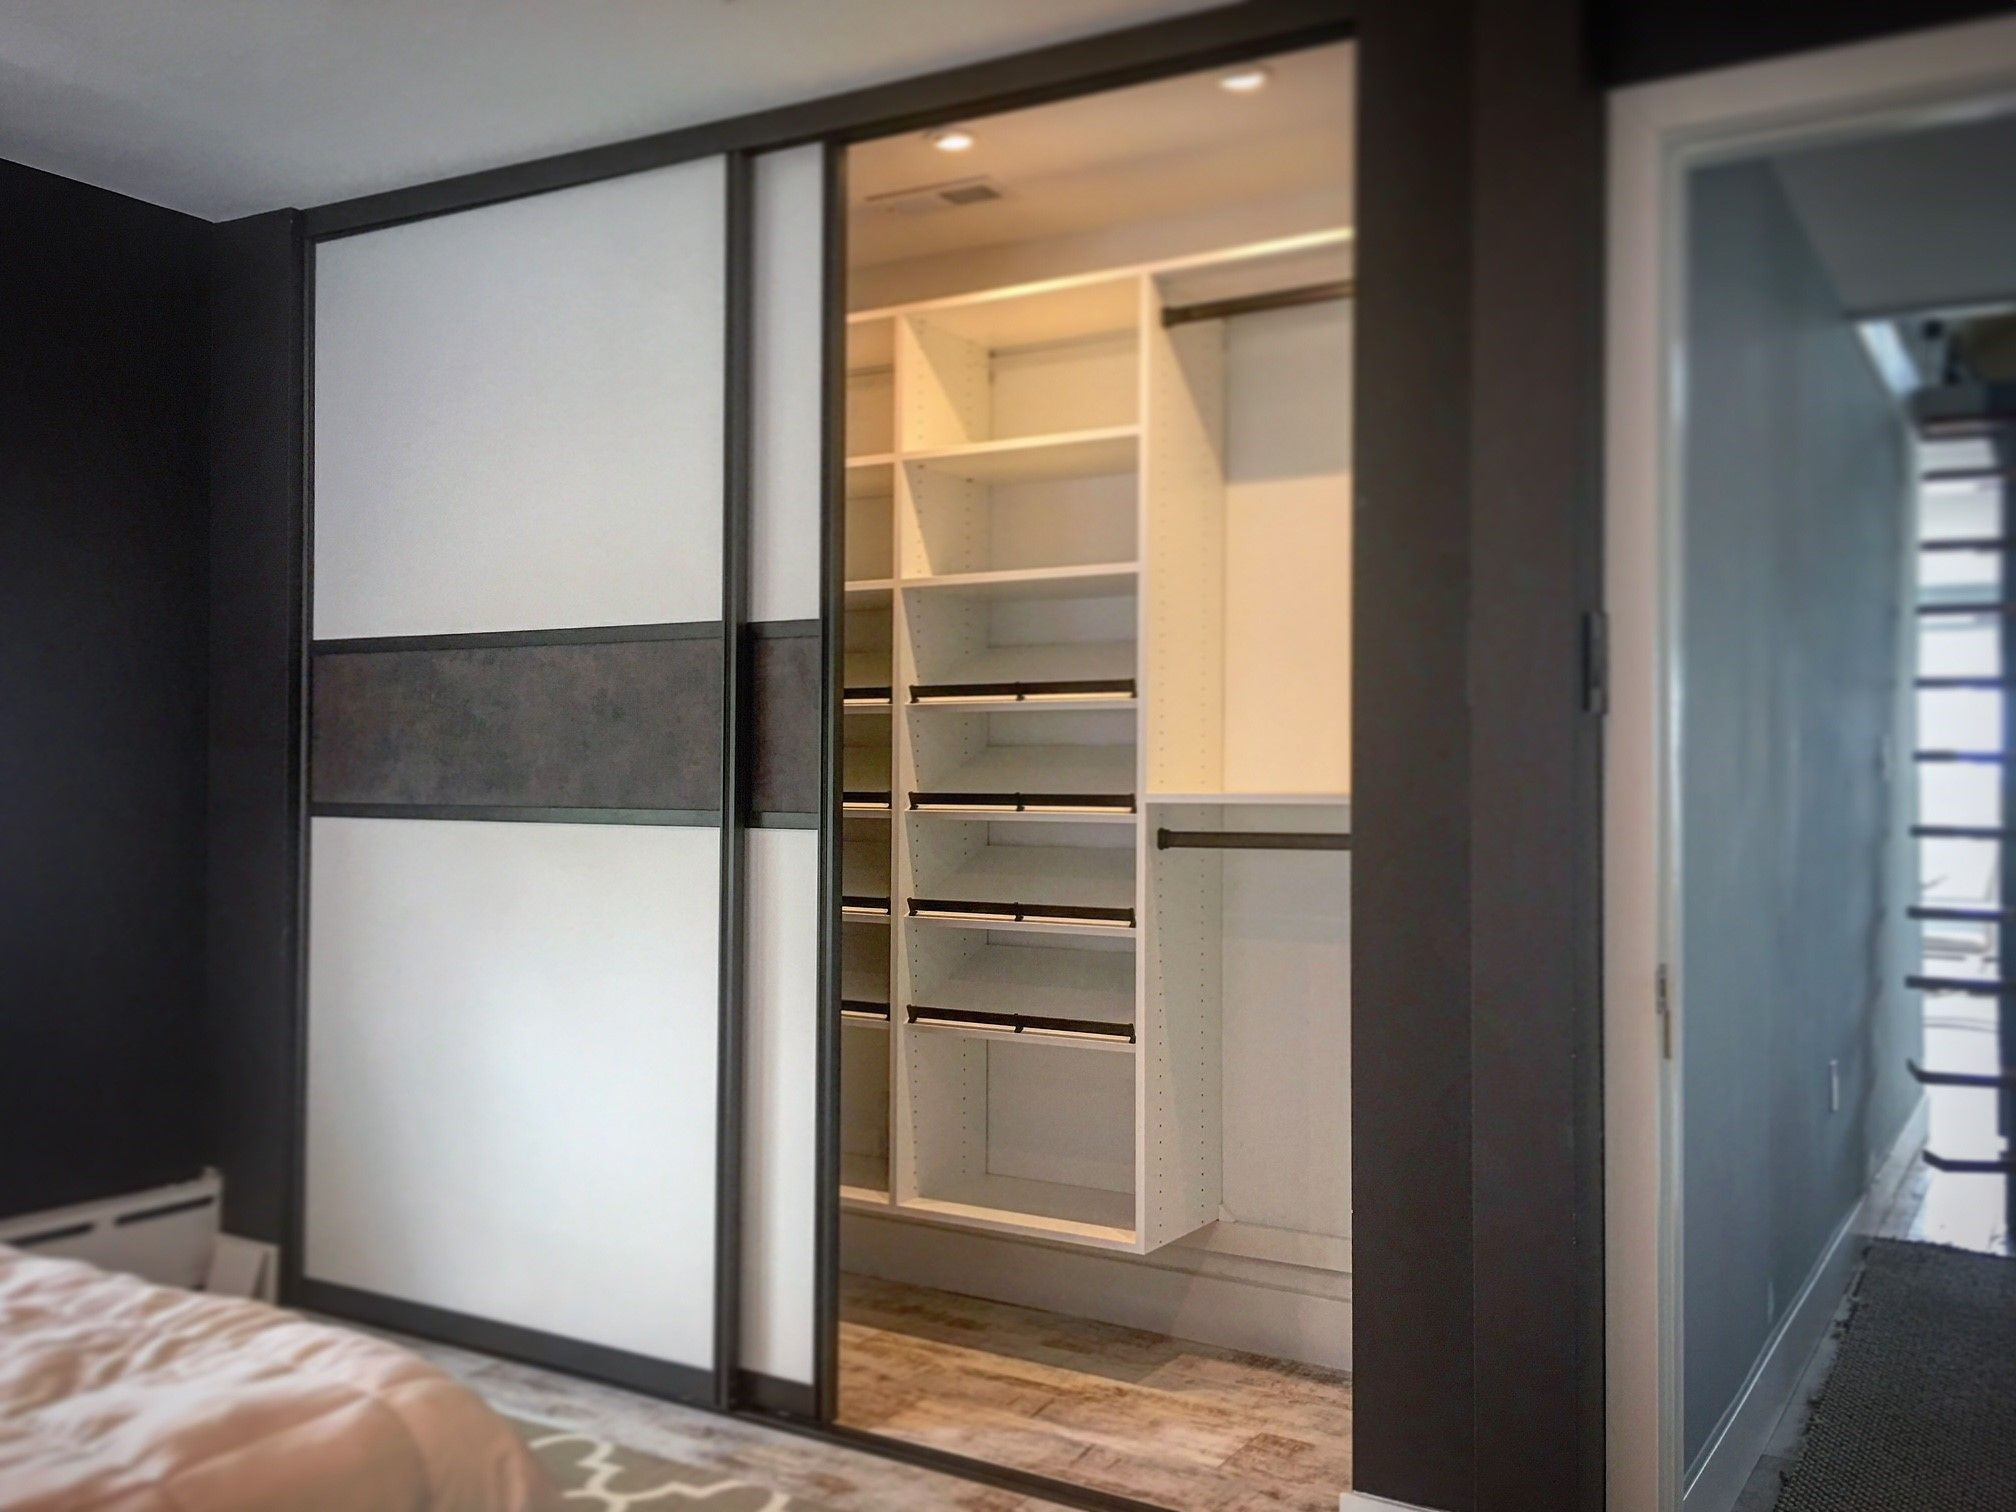 California Closets Reach In With Double Sliding Doors Lago Finish Bellissima White Oil Rubbed Bronze Hardware Tesoro Maya Insert